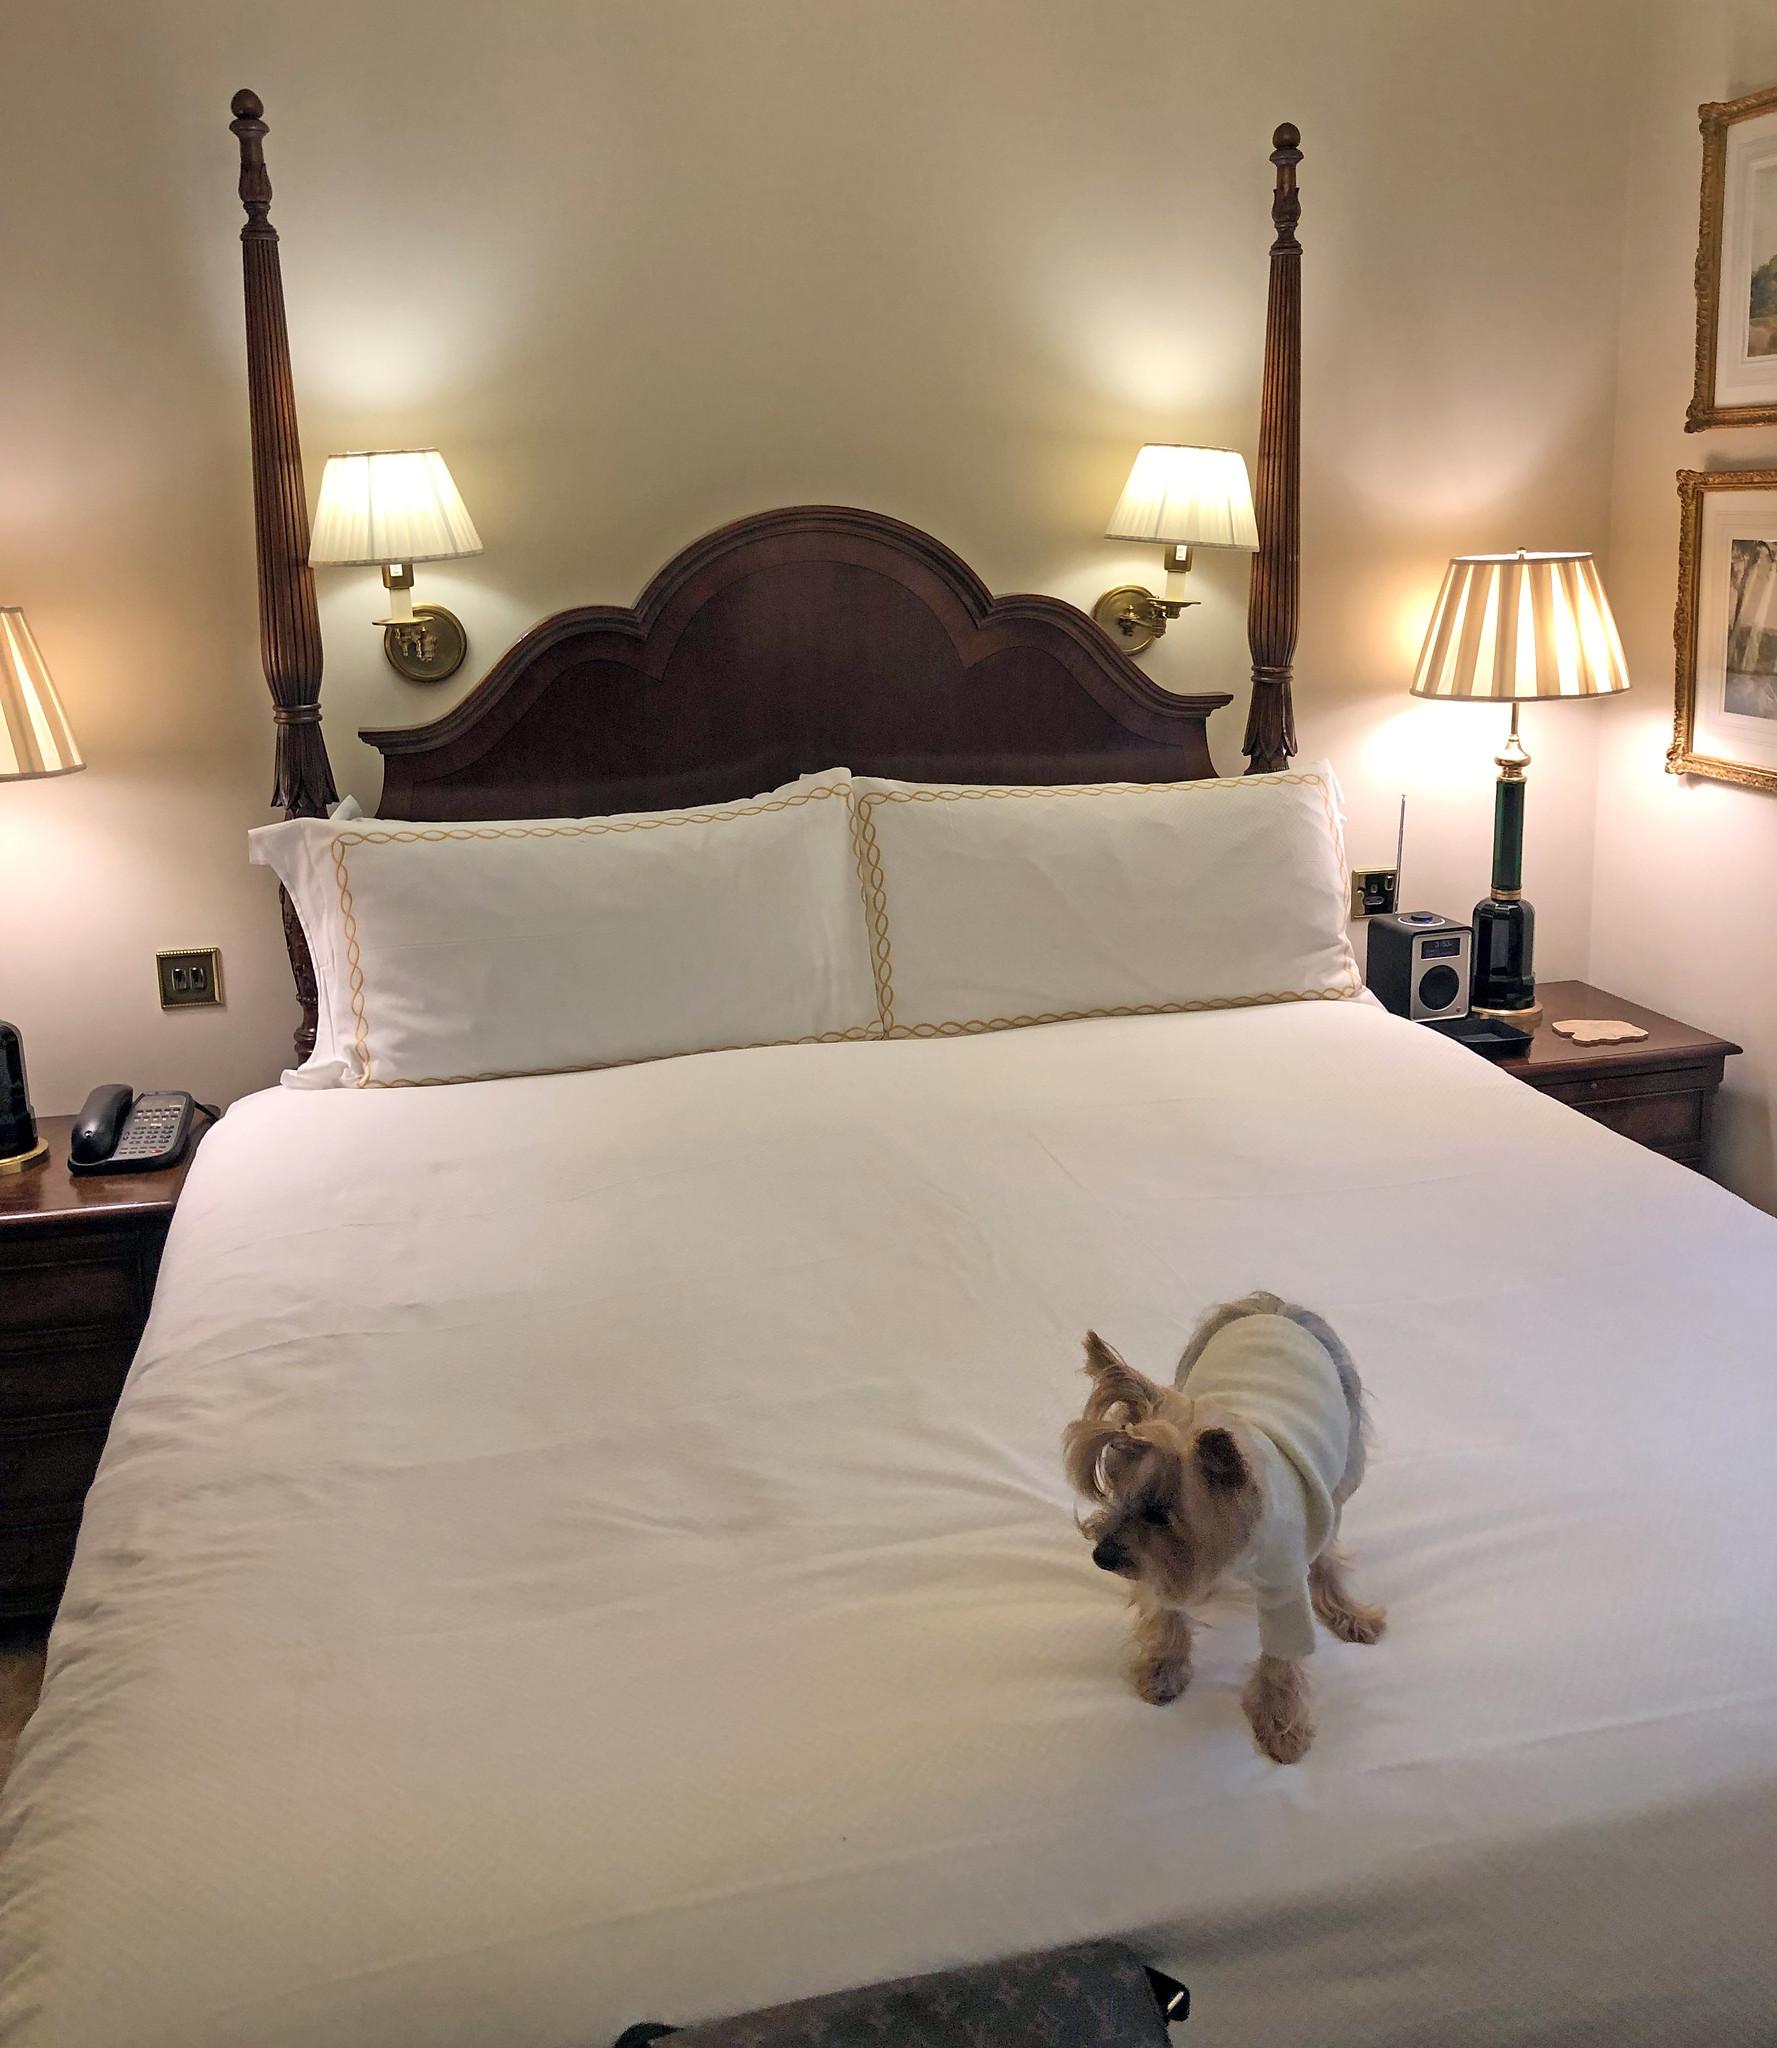 Hotel Savoy de Londres - The Savoy London - Thewotme hotel savoy de londres - 50940489991 9819bf5c29 k - El histórico Hotel Savoy de Londres